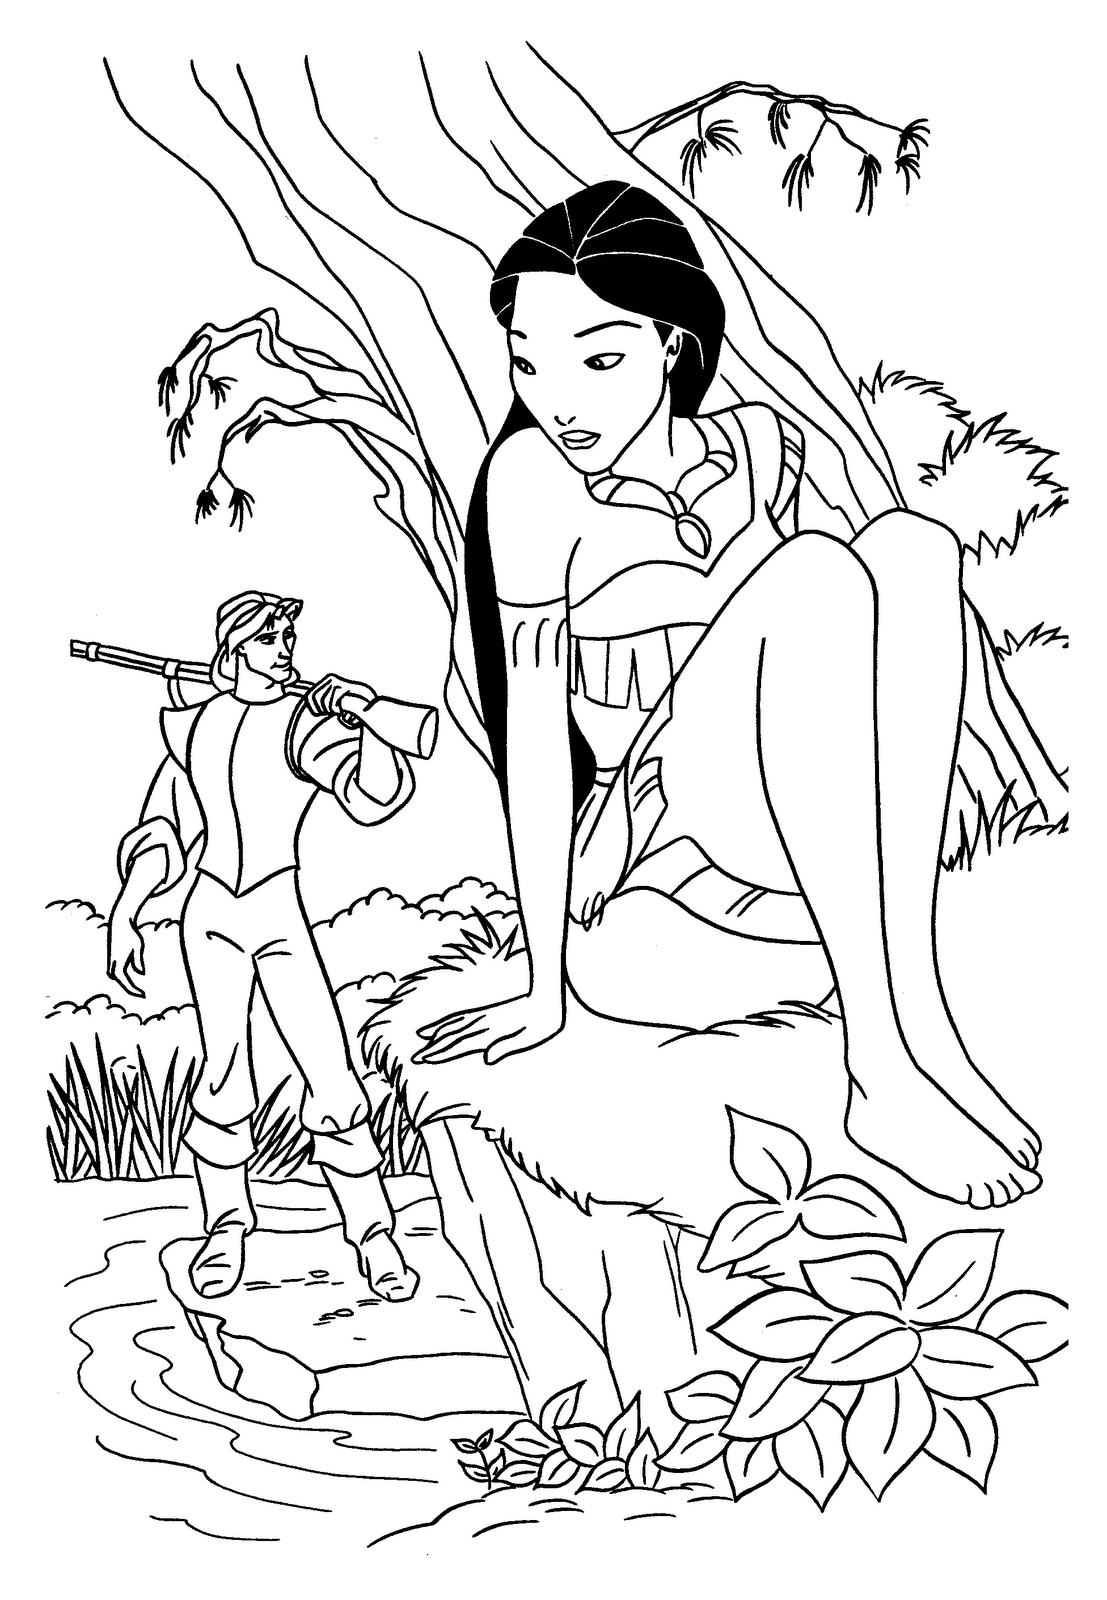 disney+princess+coloring+pages | Disney Princess Pocahontas Coloring ...